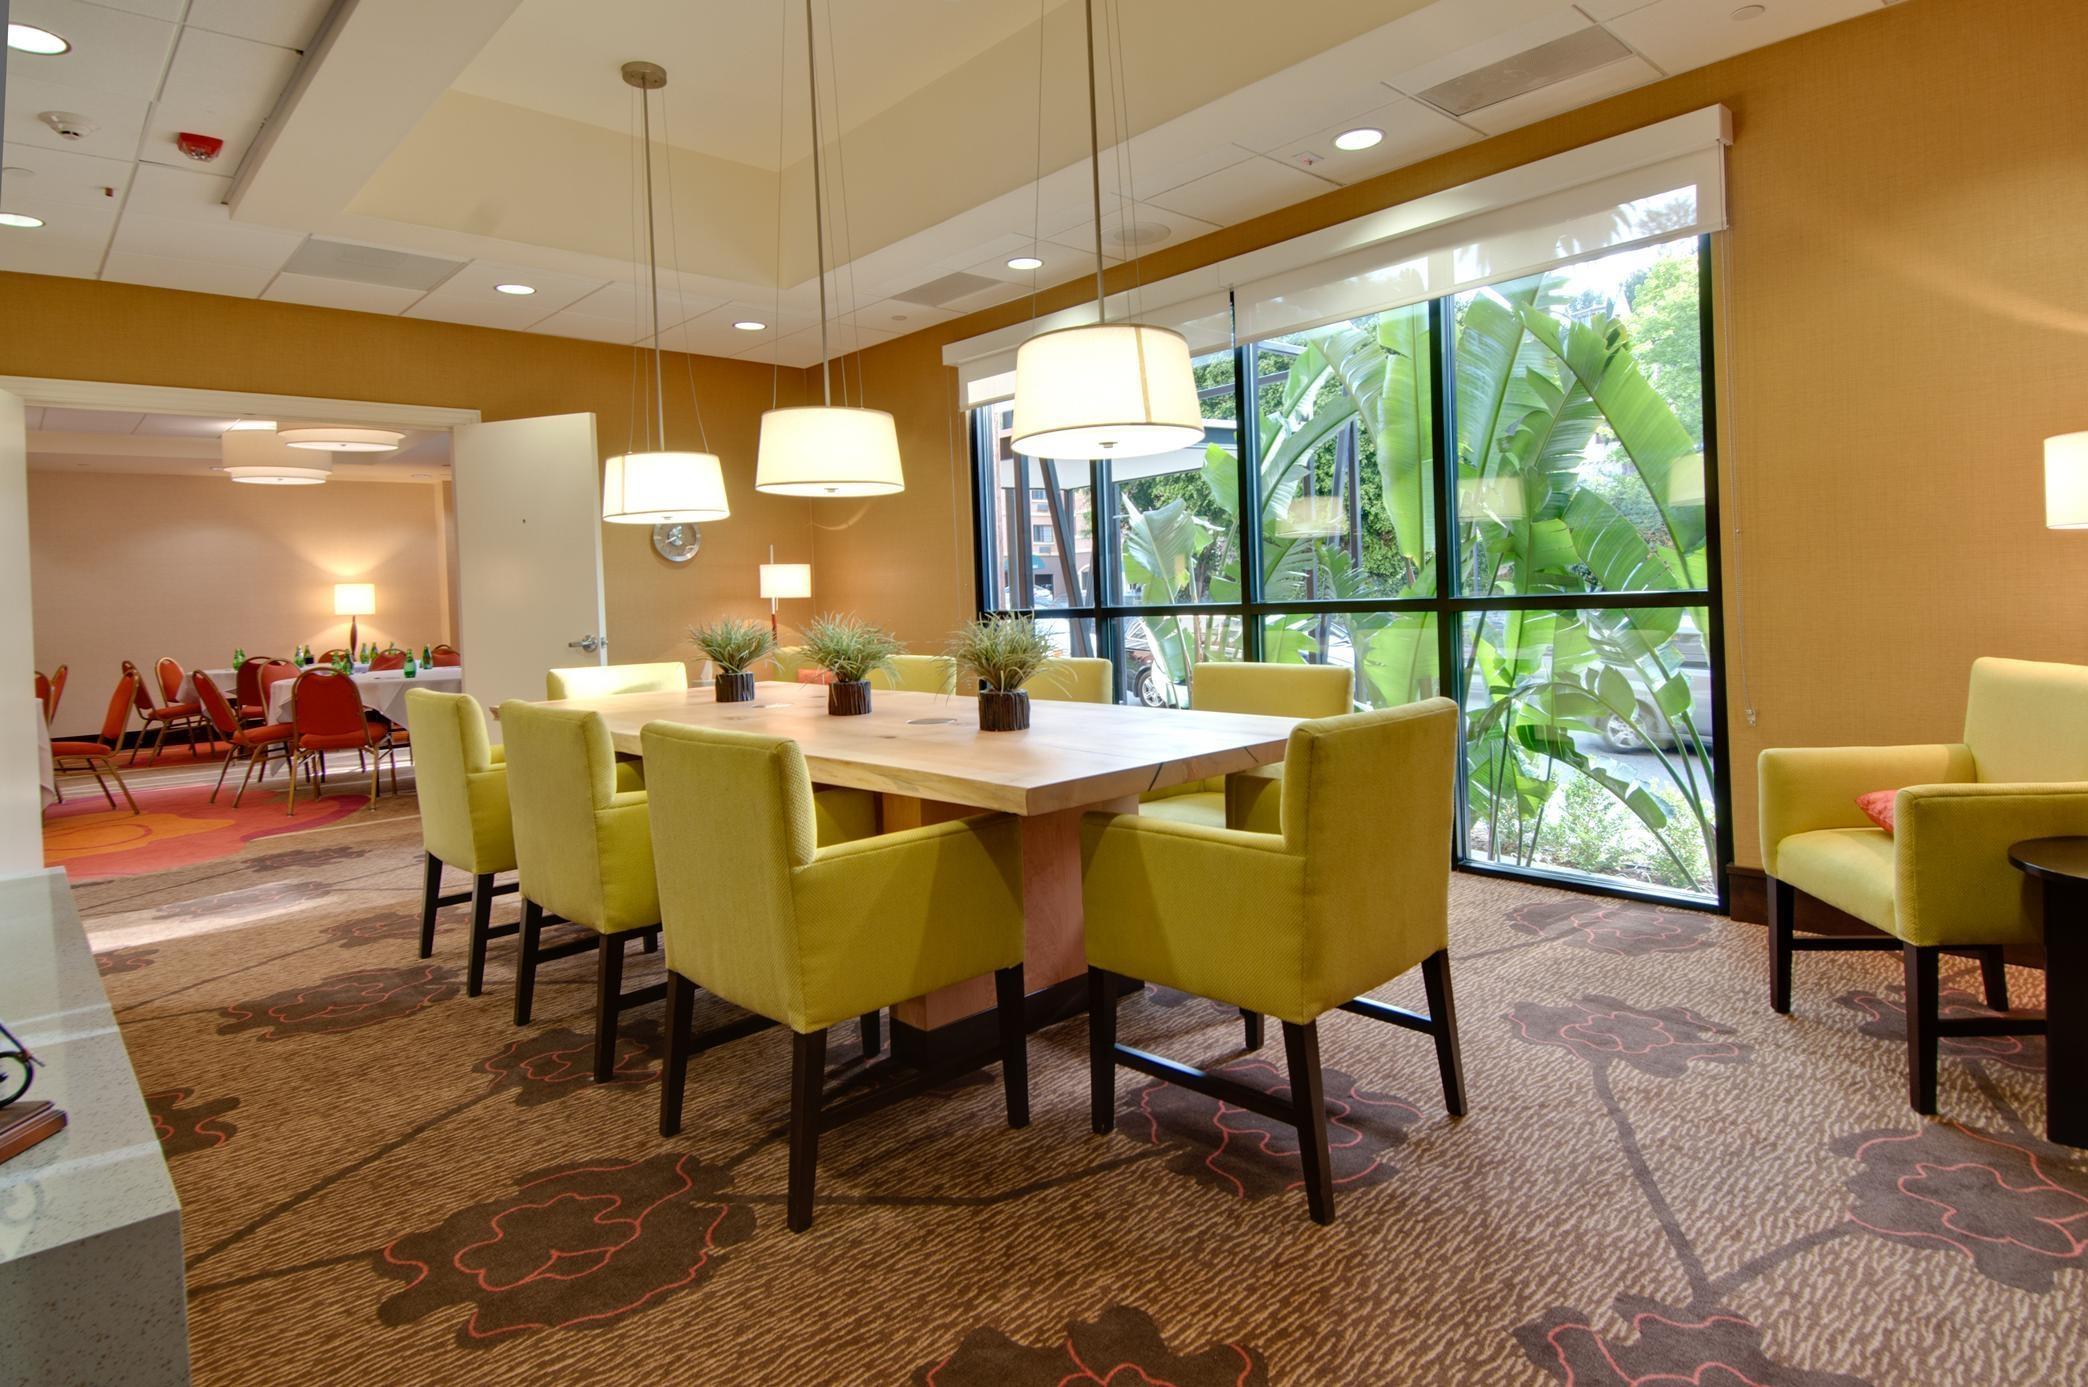 Hilton Garden Inn Los Angeles/Hollywood image 26